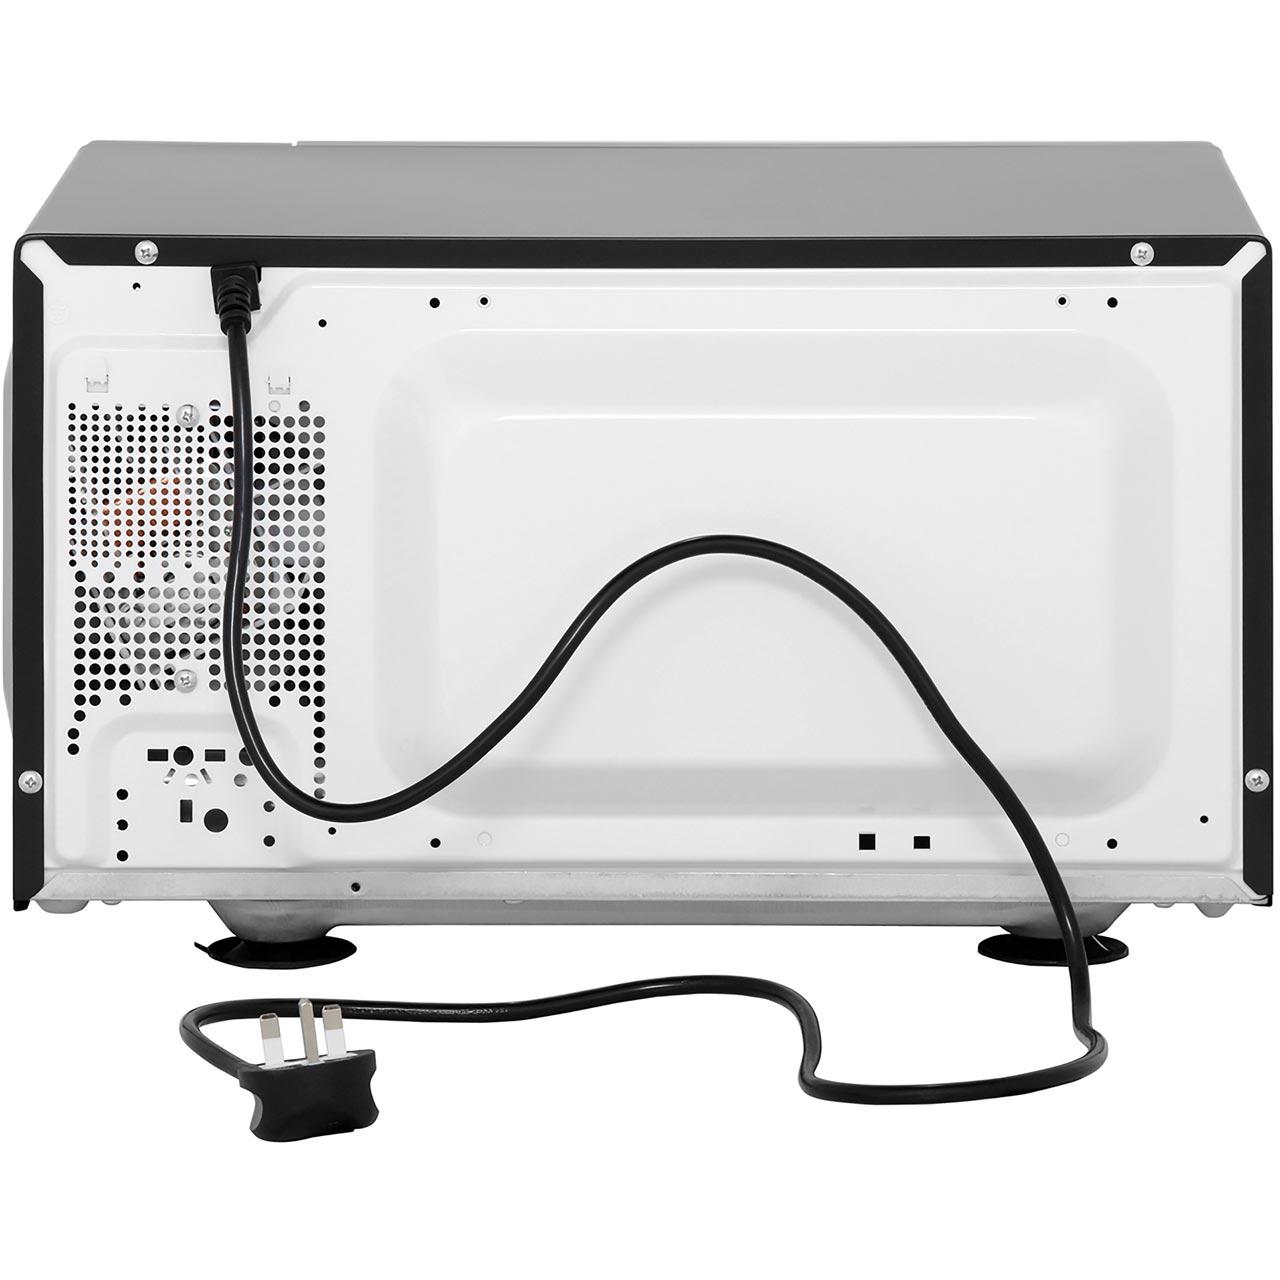 Sharp R360SLM 23 Litre Microwave